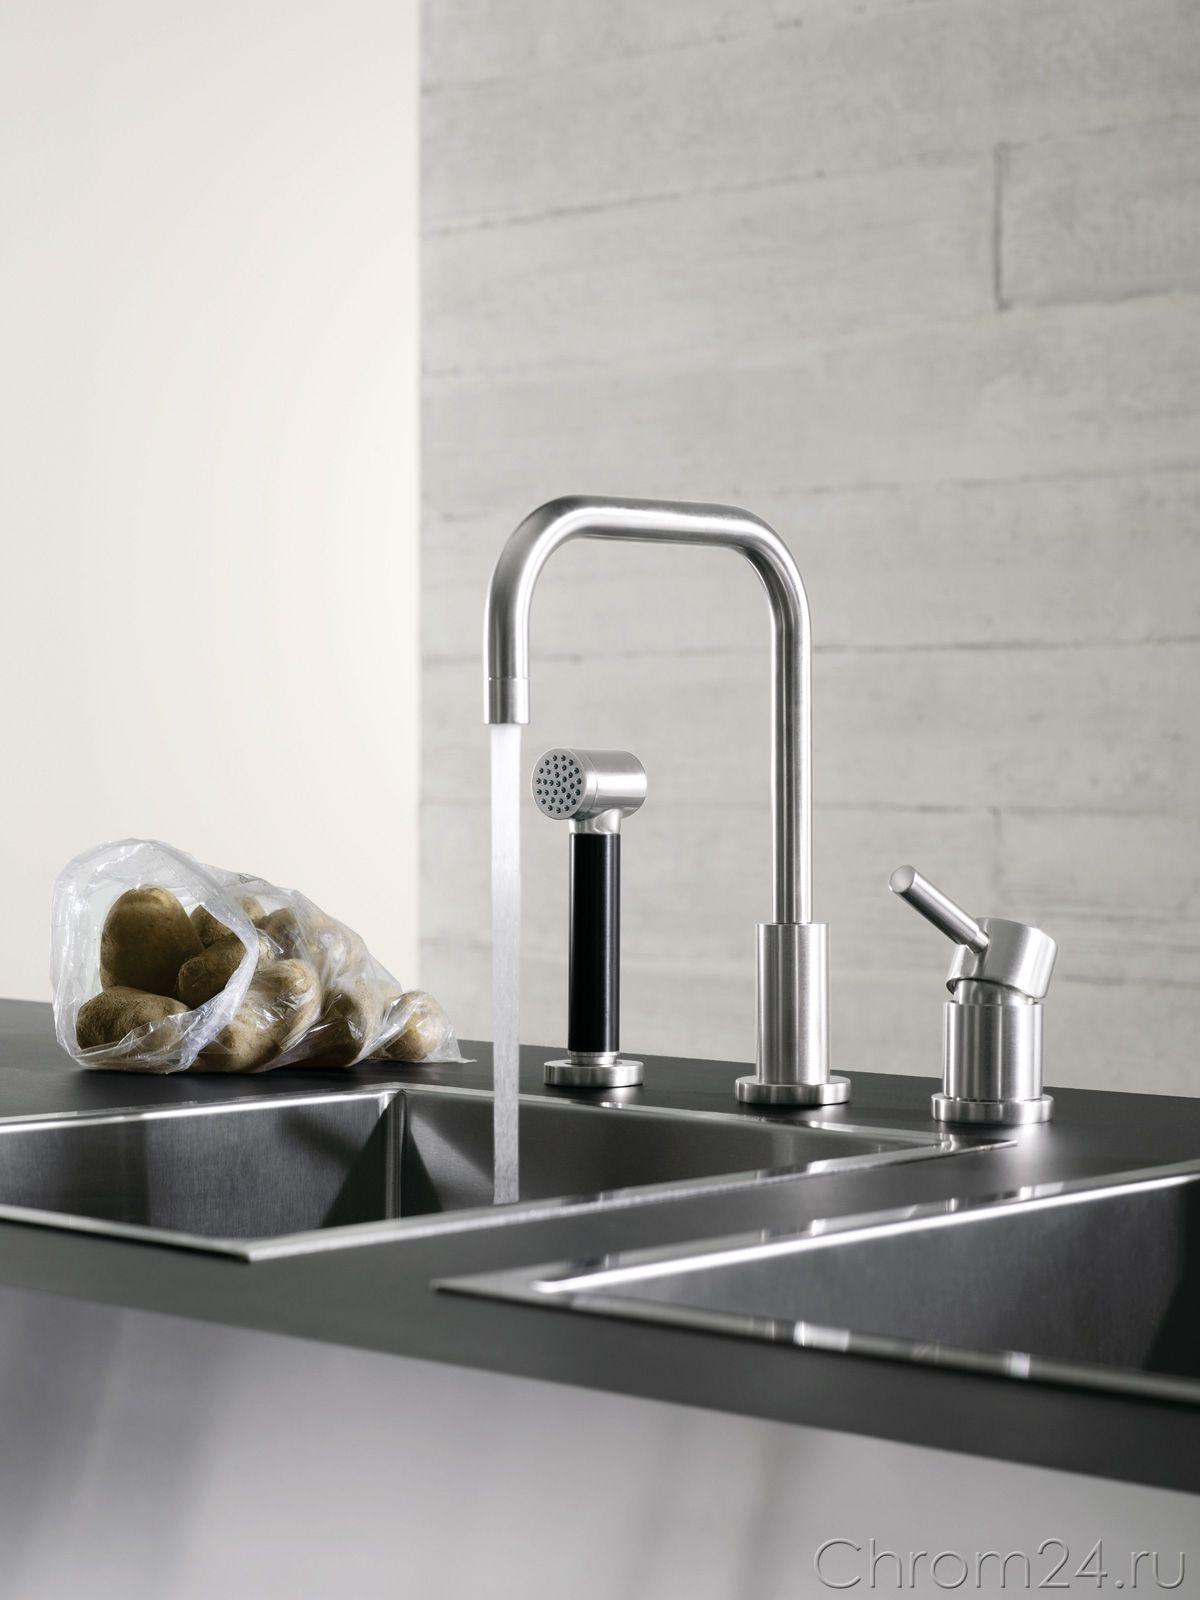 Dornbrachtu0027s Kitchen Faucet With Hand Spray / Collection